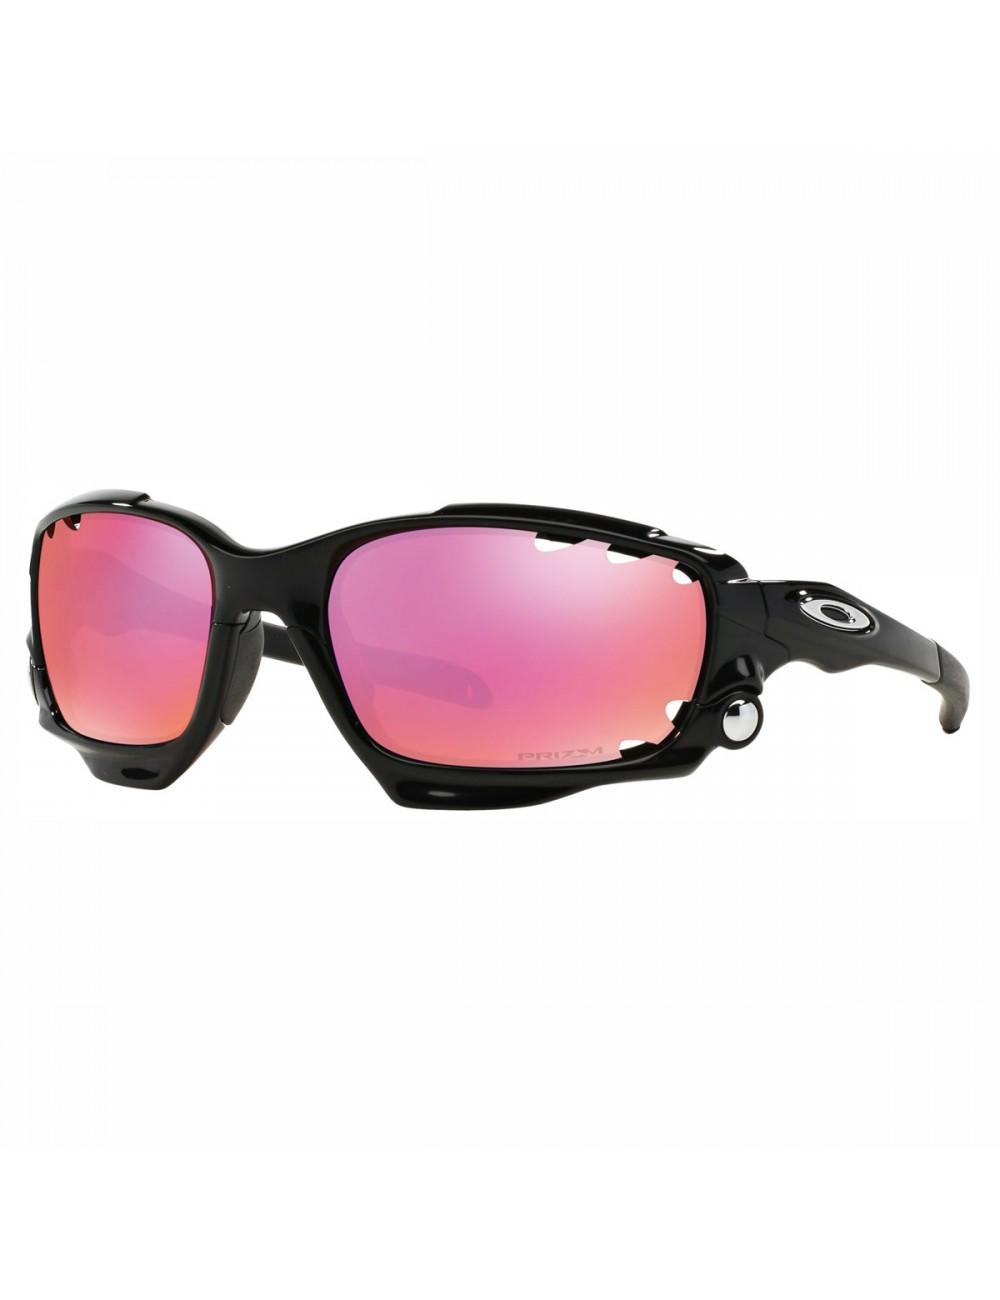 Oakley Racing Jacket Sunglasses - Black_11404